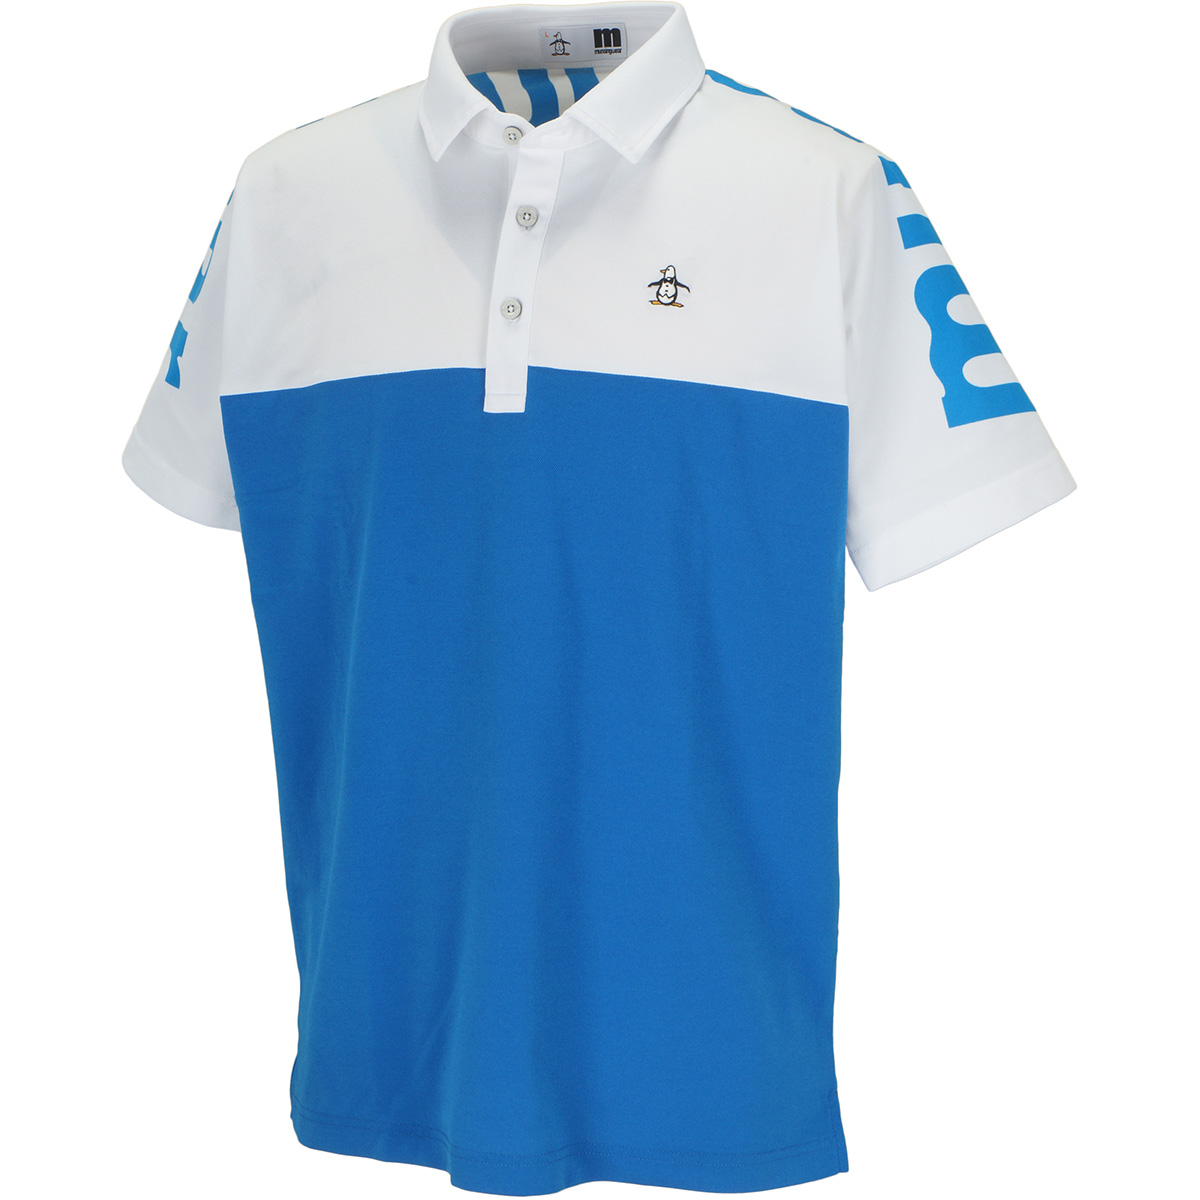 ENVOY SUNSCREEN ストレッチ ビッグロゴ切替半袖ポロシャツ